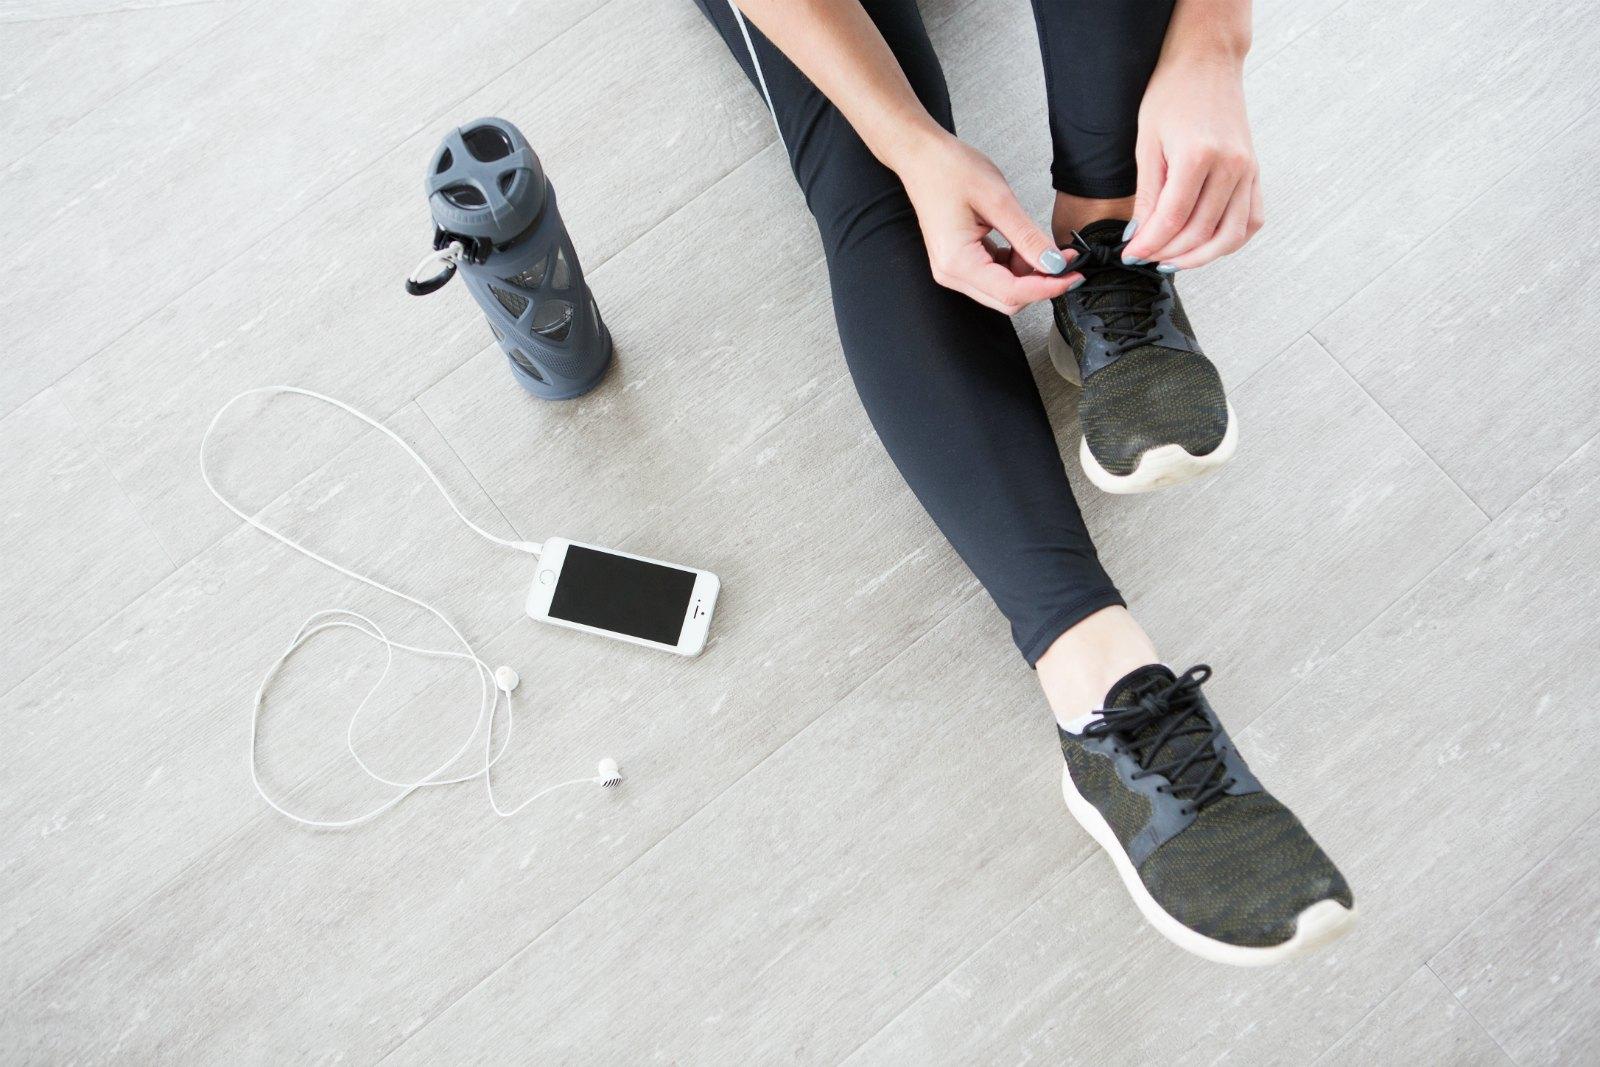 Cute Activewear BKR Spike water bottle best workout clothes zella live in leggings shop athleisure black running shoes